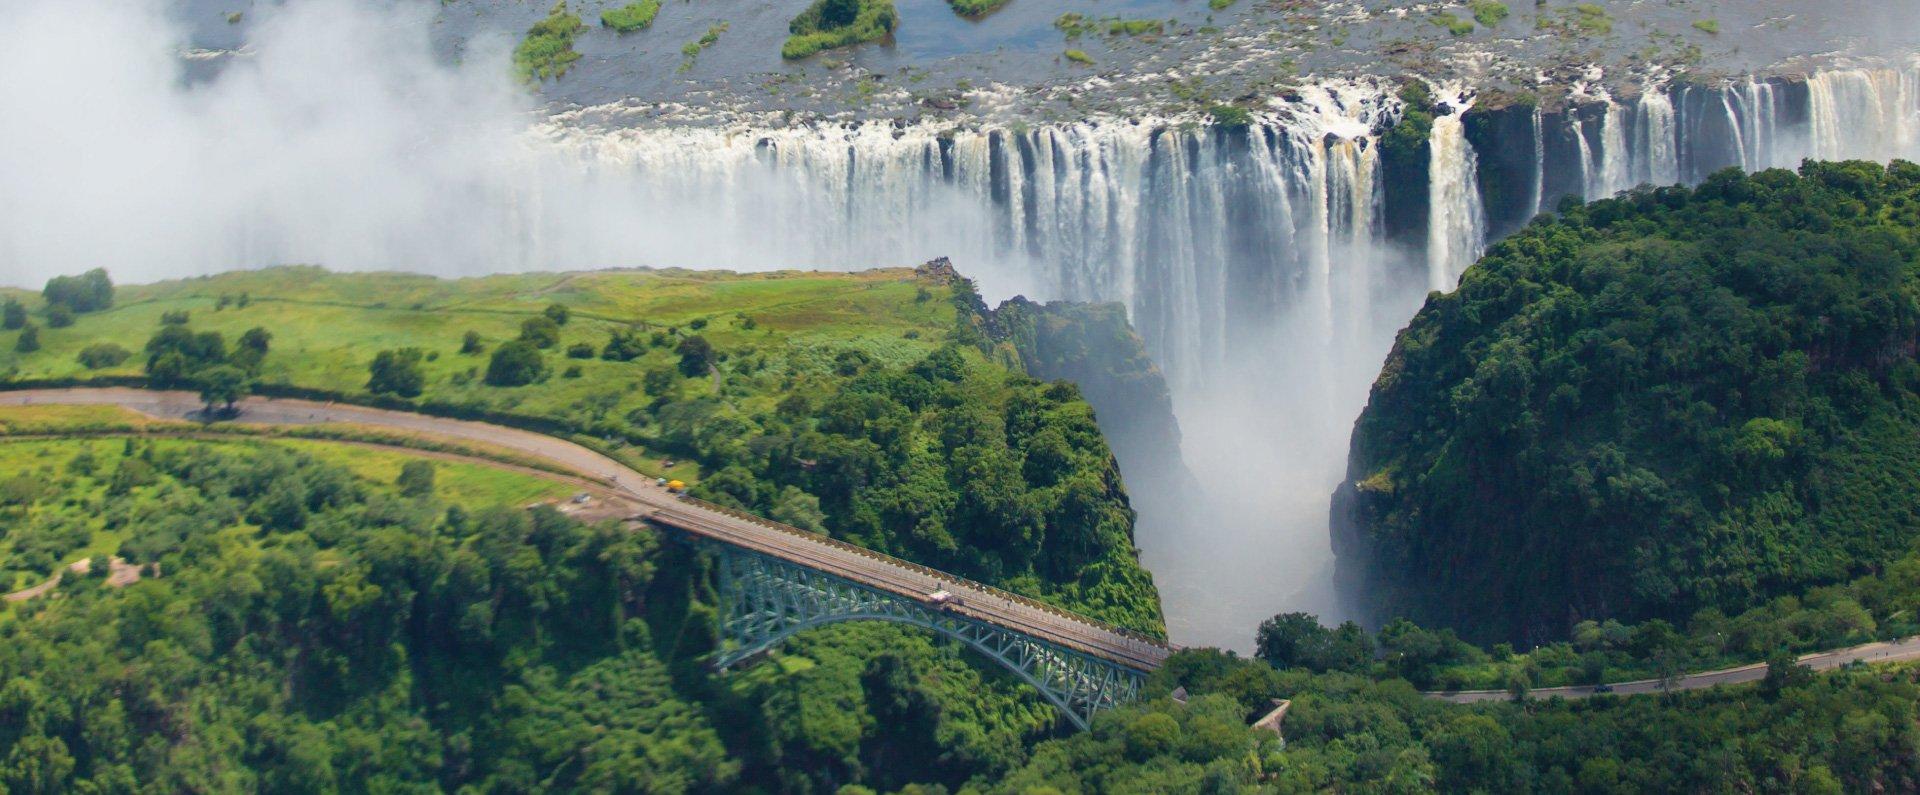 Victoria-Falls-Hotel-Aerial